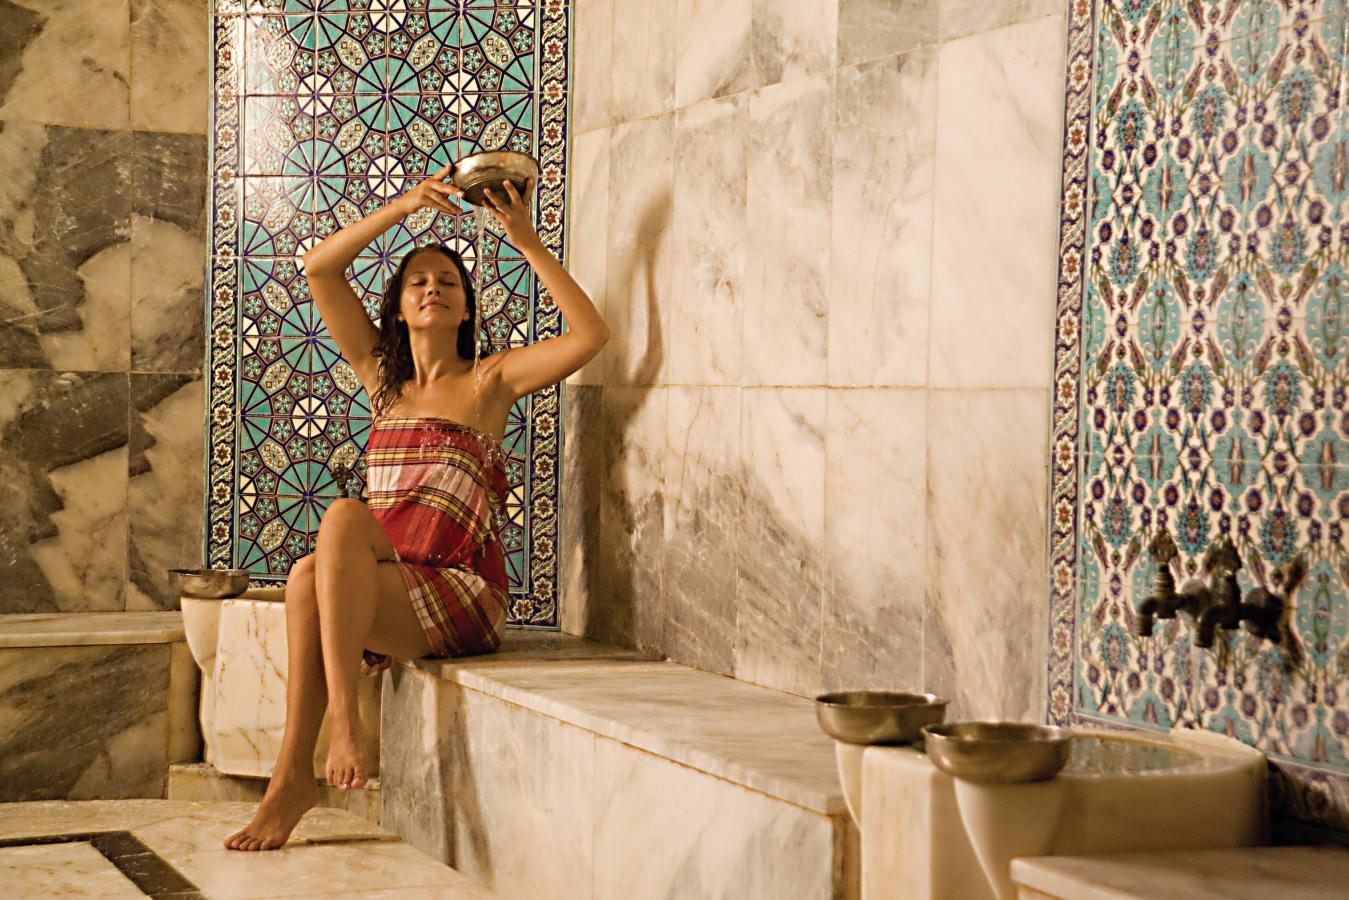 Турецкий баня хамам секс 10 фотография